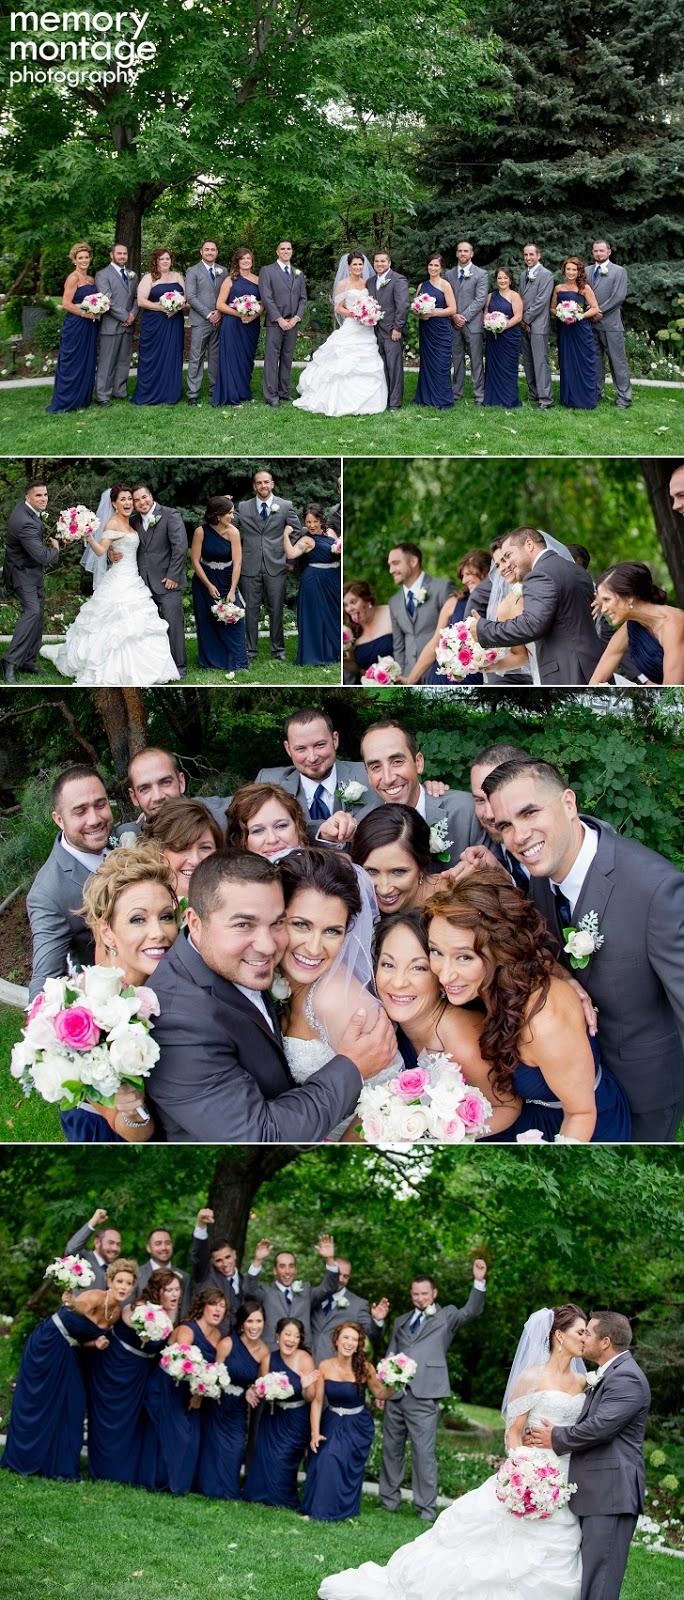 Yakima Wedding Photographer, Miranda and Ben, Cascade Gardens Wedding, Memory Montage Photography, www.memorymp.com, Yakima Photographers, Wedding Photography